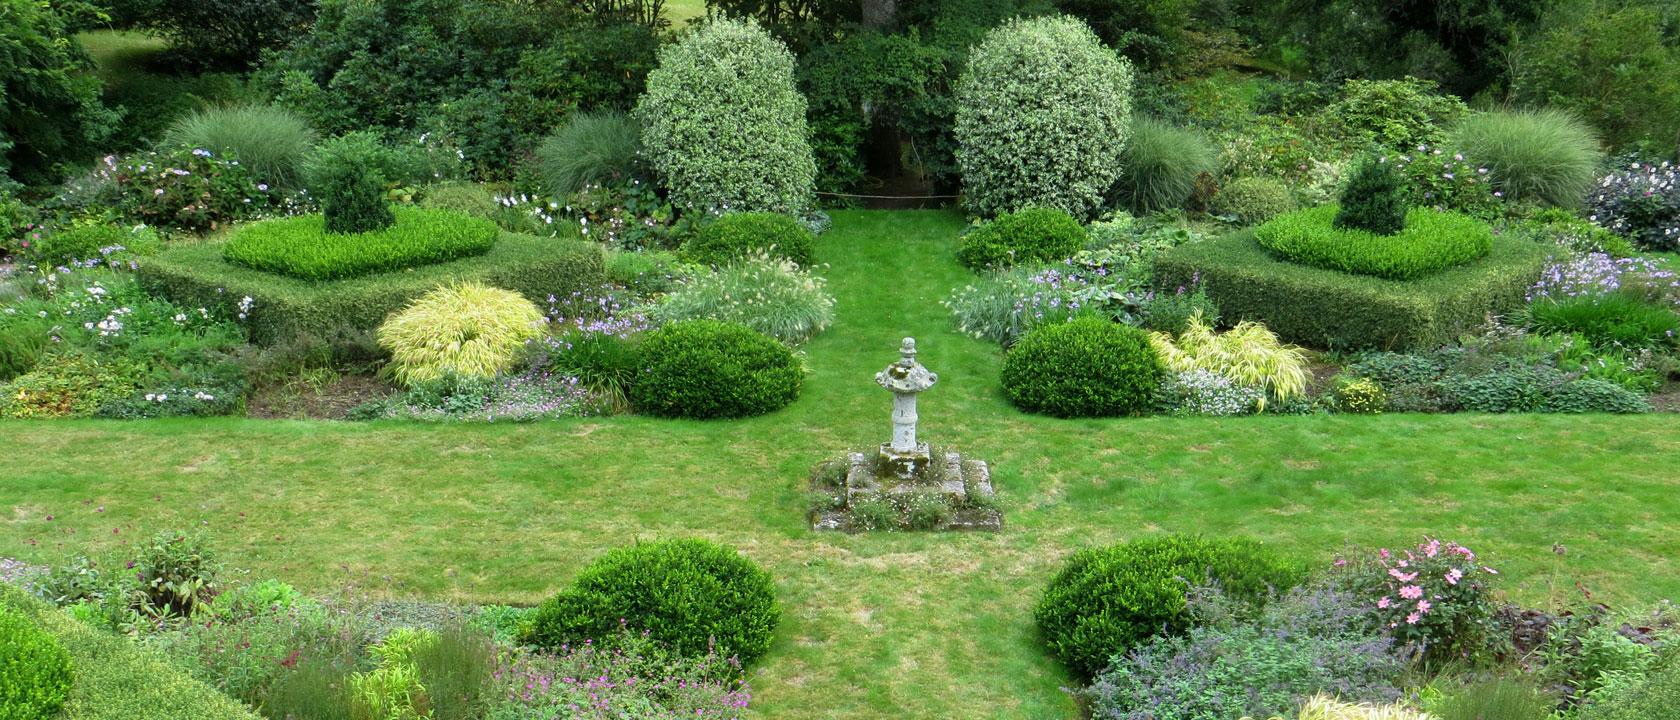 Les Jardins De Kerdalo Tredarzec Brittany France John Patrick14